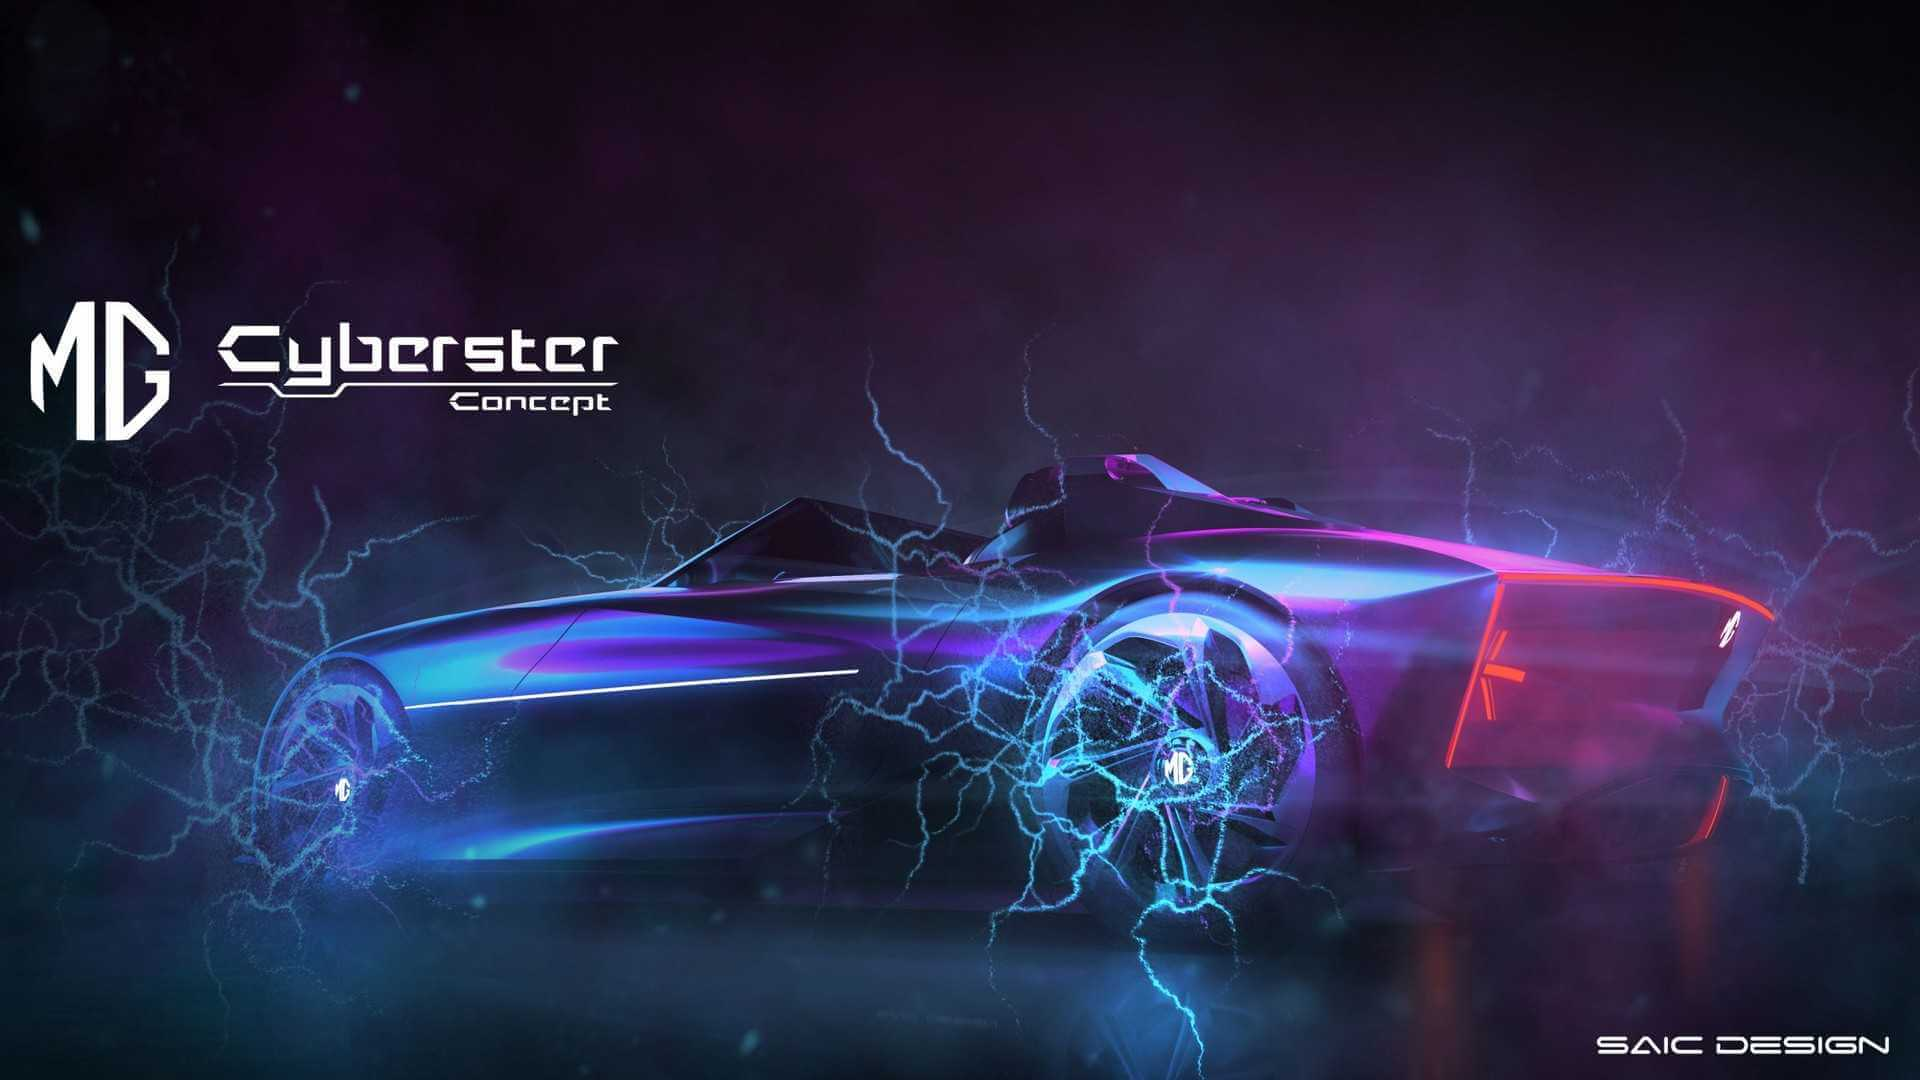 MG представила тизер концепта Cyberster